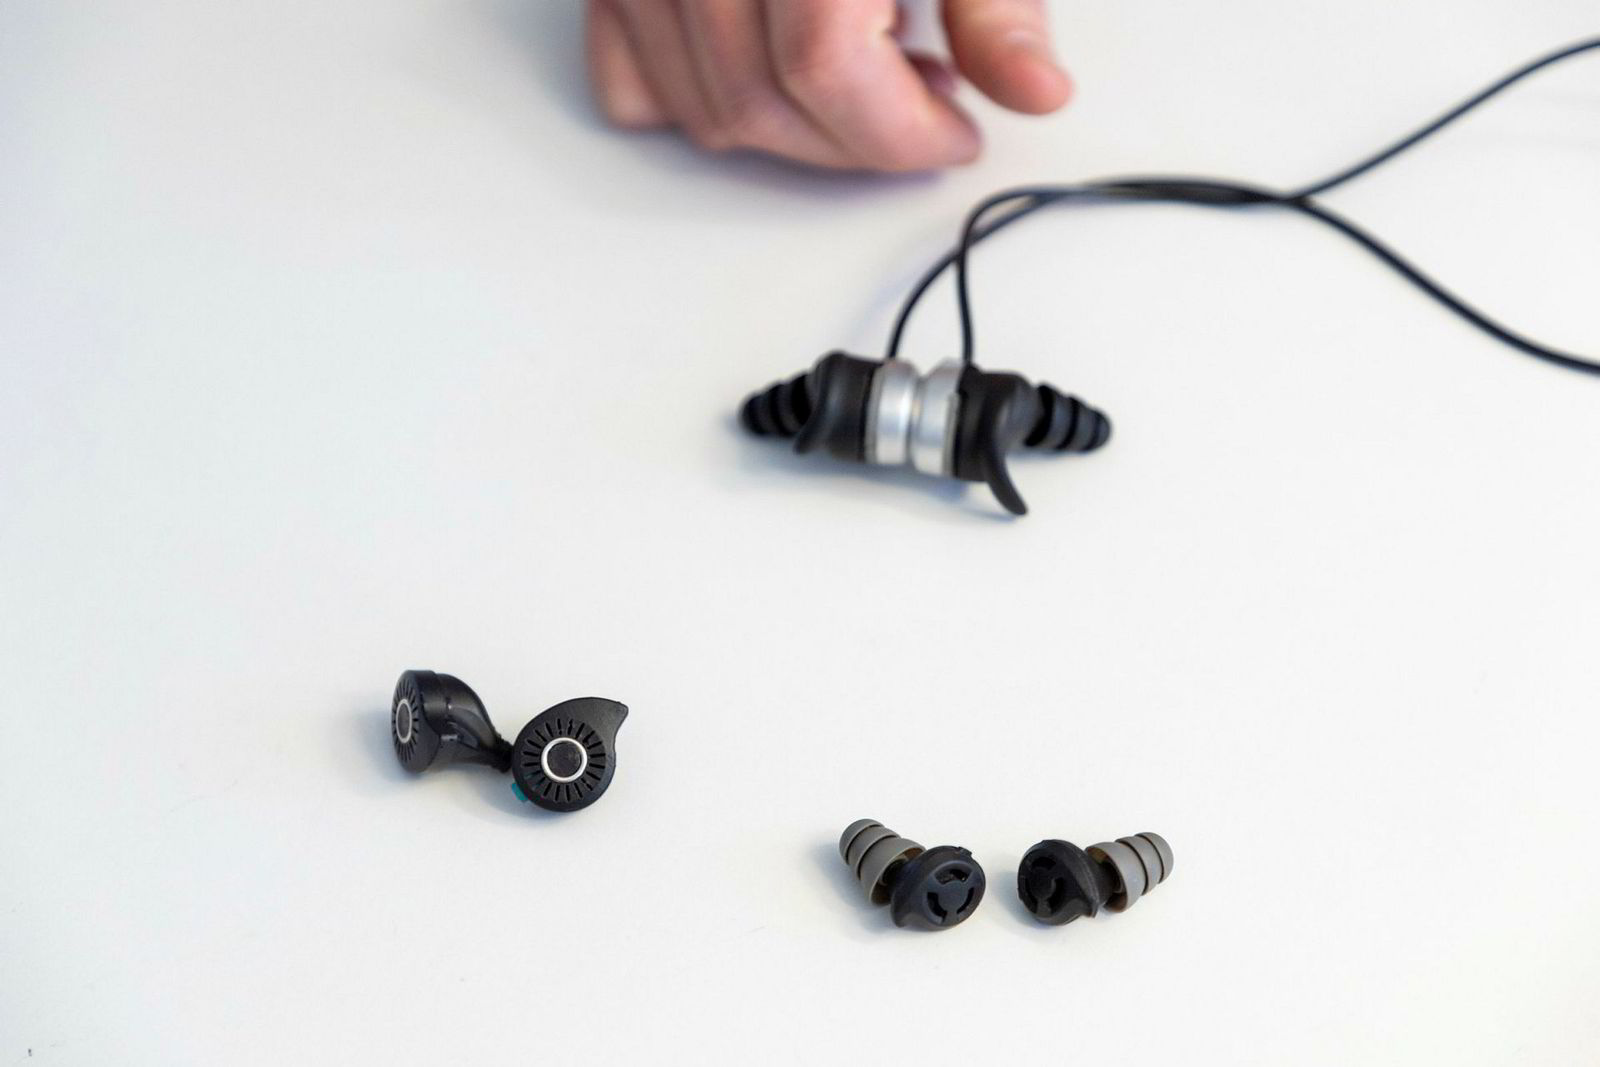 Prototyper på ulike varianter av hørselvern i proppeform. De minste er tiltenkt musikere.